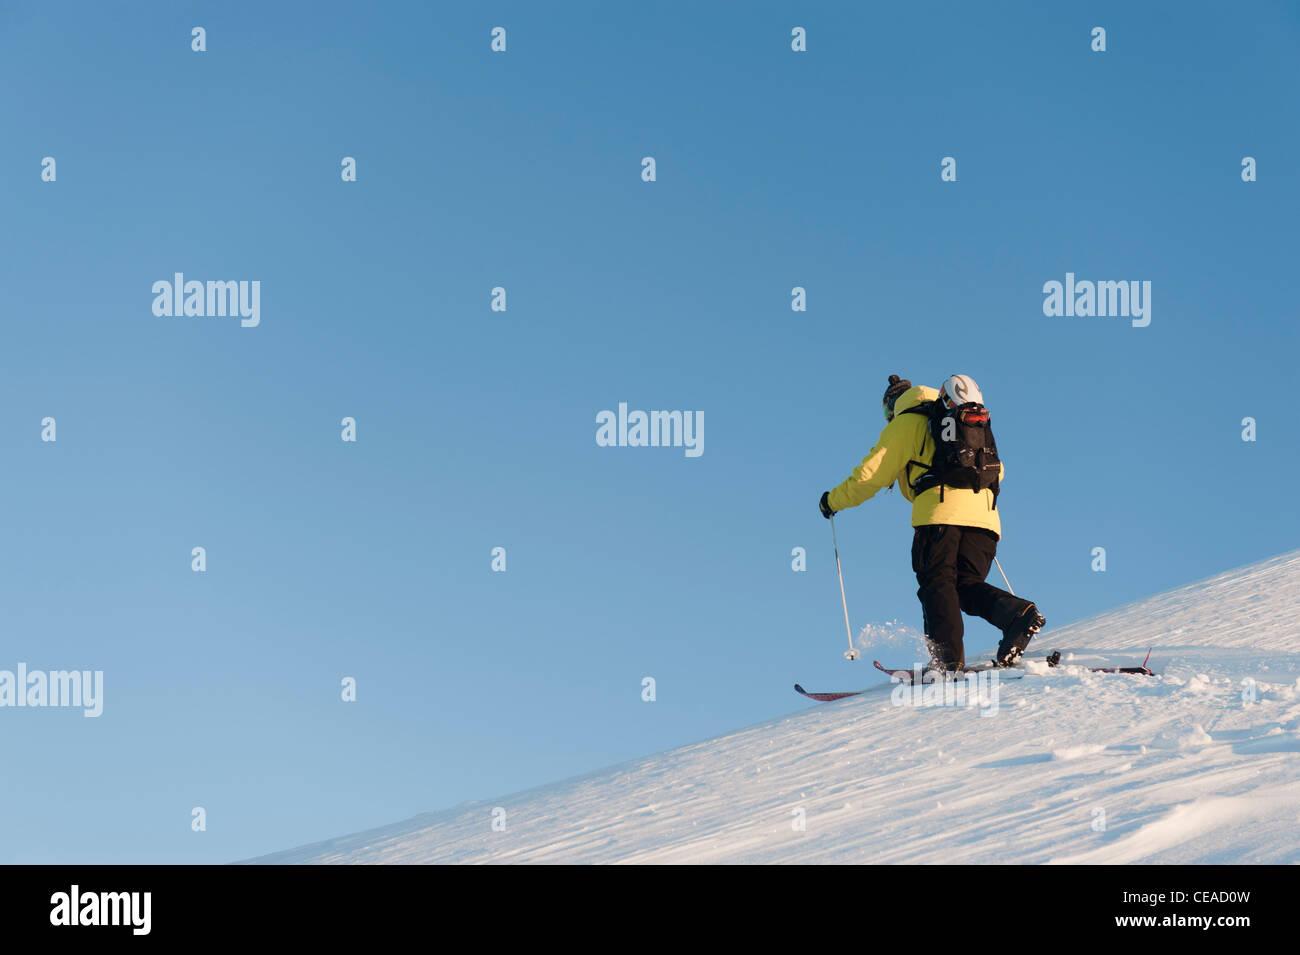 Ski touring in Kittelfjäll, Sweden. - Stock Image